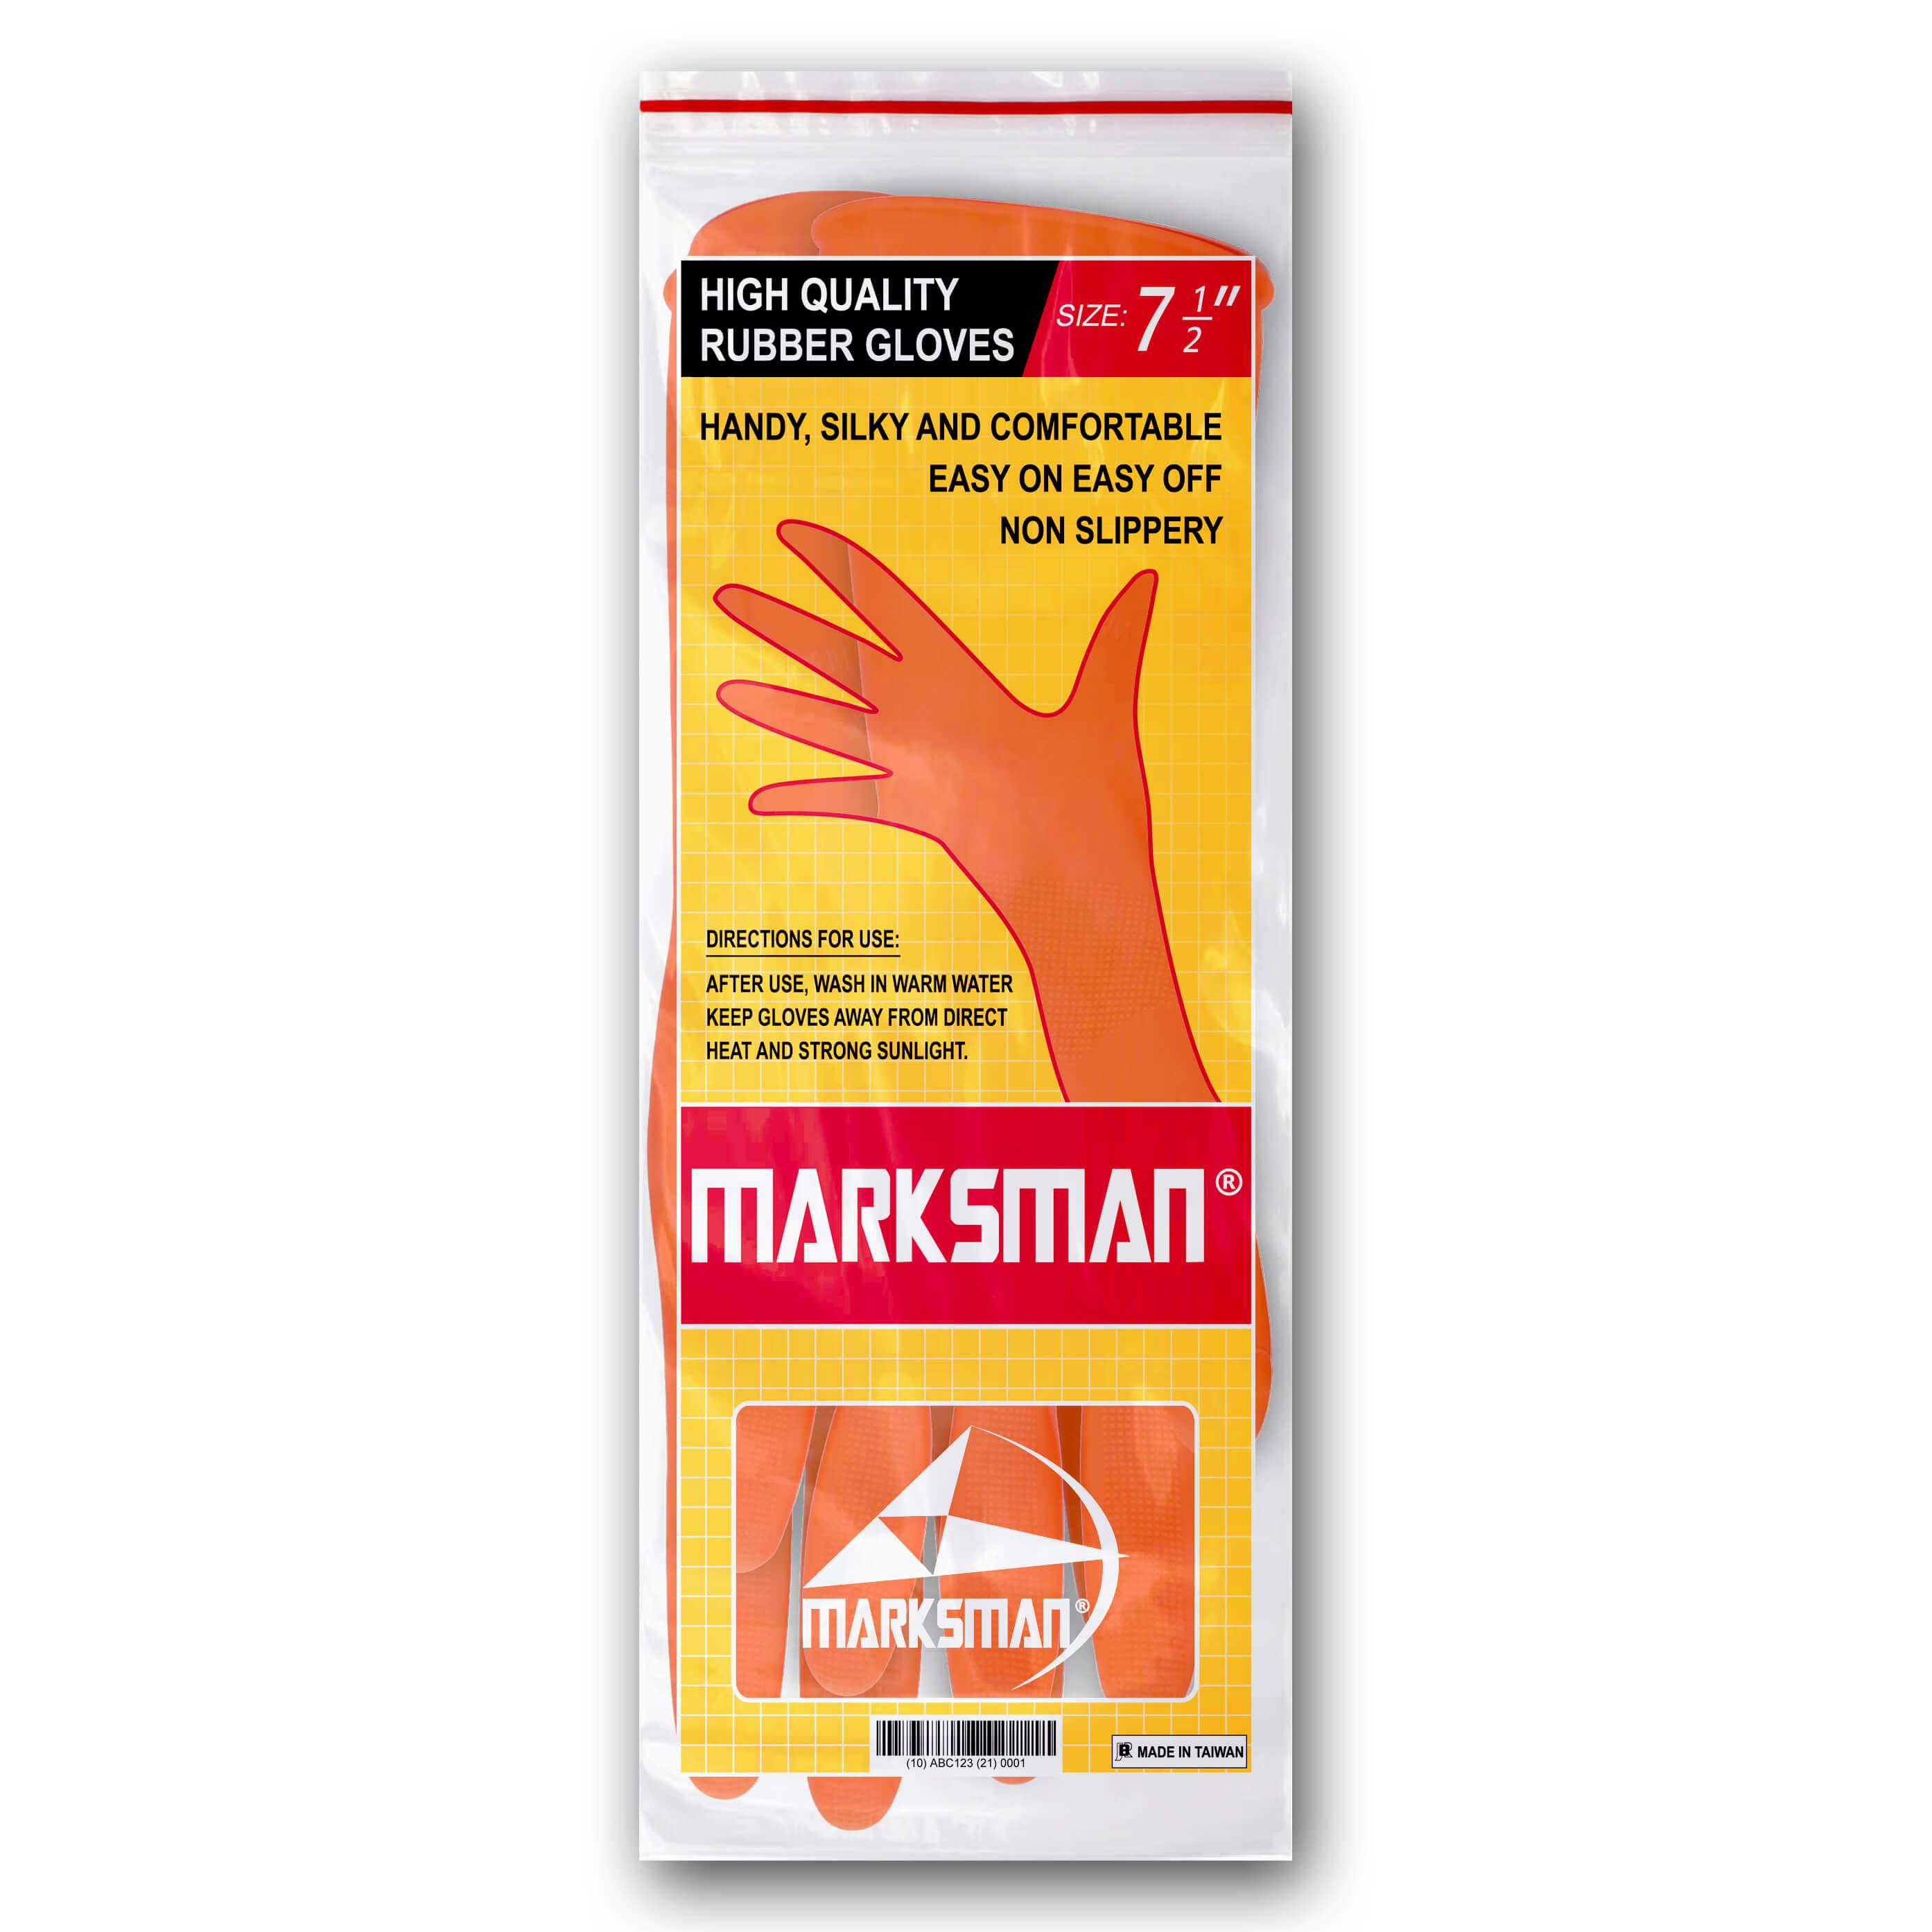 work gloves, latex gloves, chemical gloves, safety gloves, heavy duty gloves, protective gloves, mechanic latex gloves, mechanic rubber gloves, nitrile mechanics gloves, unrippable gloves, ansell edmont, hand protection gloves, medical rubber gloves, safety work gloves, dishwashing gloves, latex work gloves wholesale, nitrile medical grade examination gloves, safety gloves small, strong hand gloves, warehouse work gloves, auto mechanics rubber gloves, hard wearing gloves, medical grade gloves, safety hand gloves, work safety gloves, nitrile coated gloves wholesale, chemical gloves home depot, global manufacturing gloves, mechanics black latex gloves, site gloves, x grip frog grip gloves, advanced glove and safety, auto mechanic latex gloves, hardy nitrile gloves, safety hand gloves manufacturer, edmont gloves, frog grip work gloves, hand gloves for household use, household gloves online, sterile gloves, kitchen gloves, dish scrubbing gloves, gardening gloves, household gloves, plastic gloves, dish gloves, washing gloves, dishwashing gloves, best dishwashing gloves, rubber gloves for washing dishes